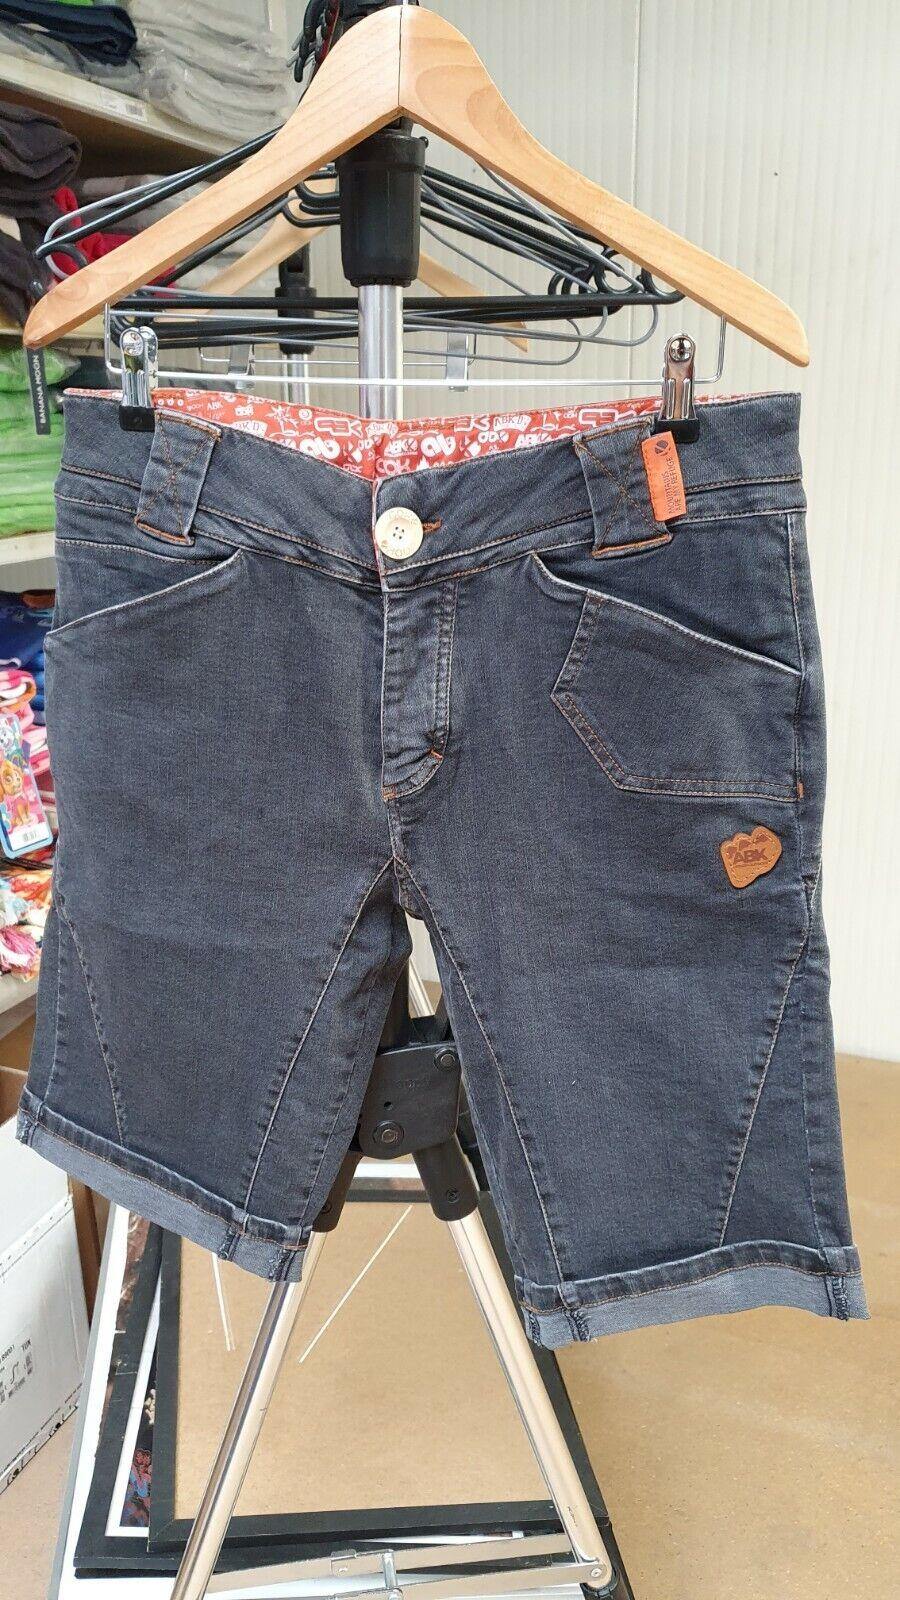 ELO1 #51 Bermuda Jean Shorts - Sport Man Abk - Yoda Shorts Old Black